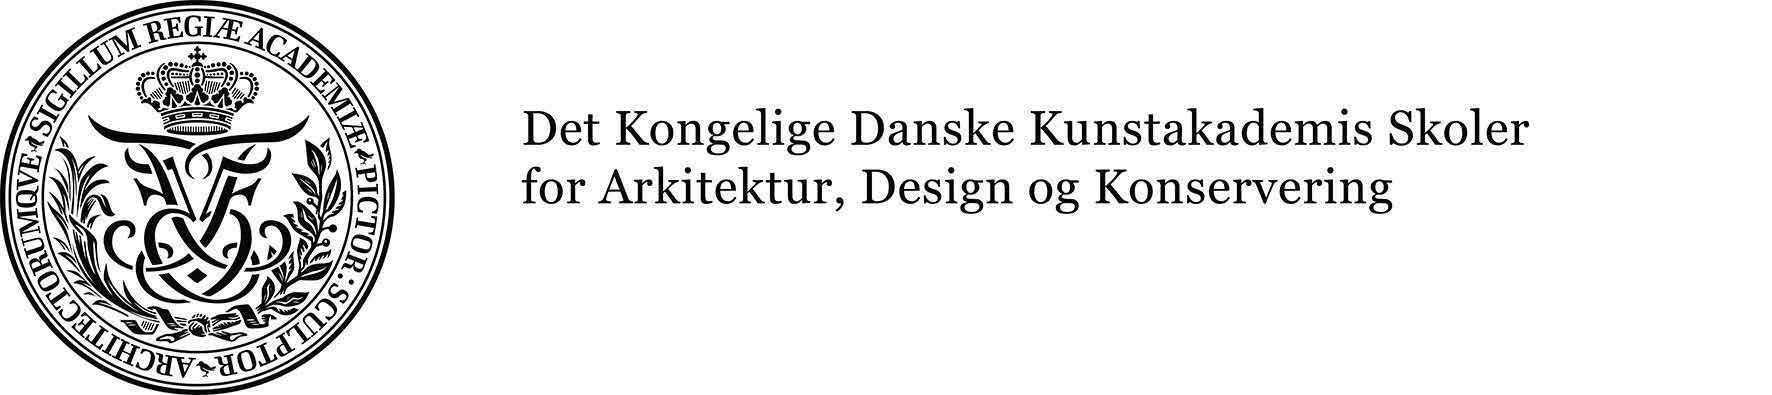 kadk-dk-logo